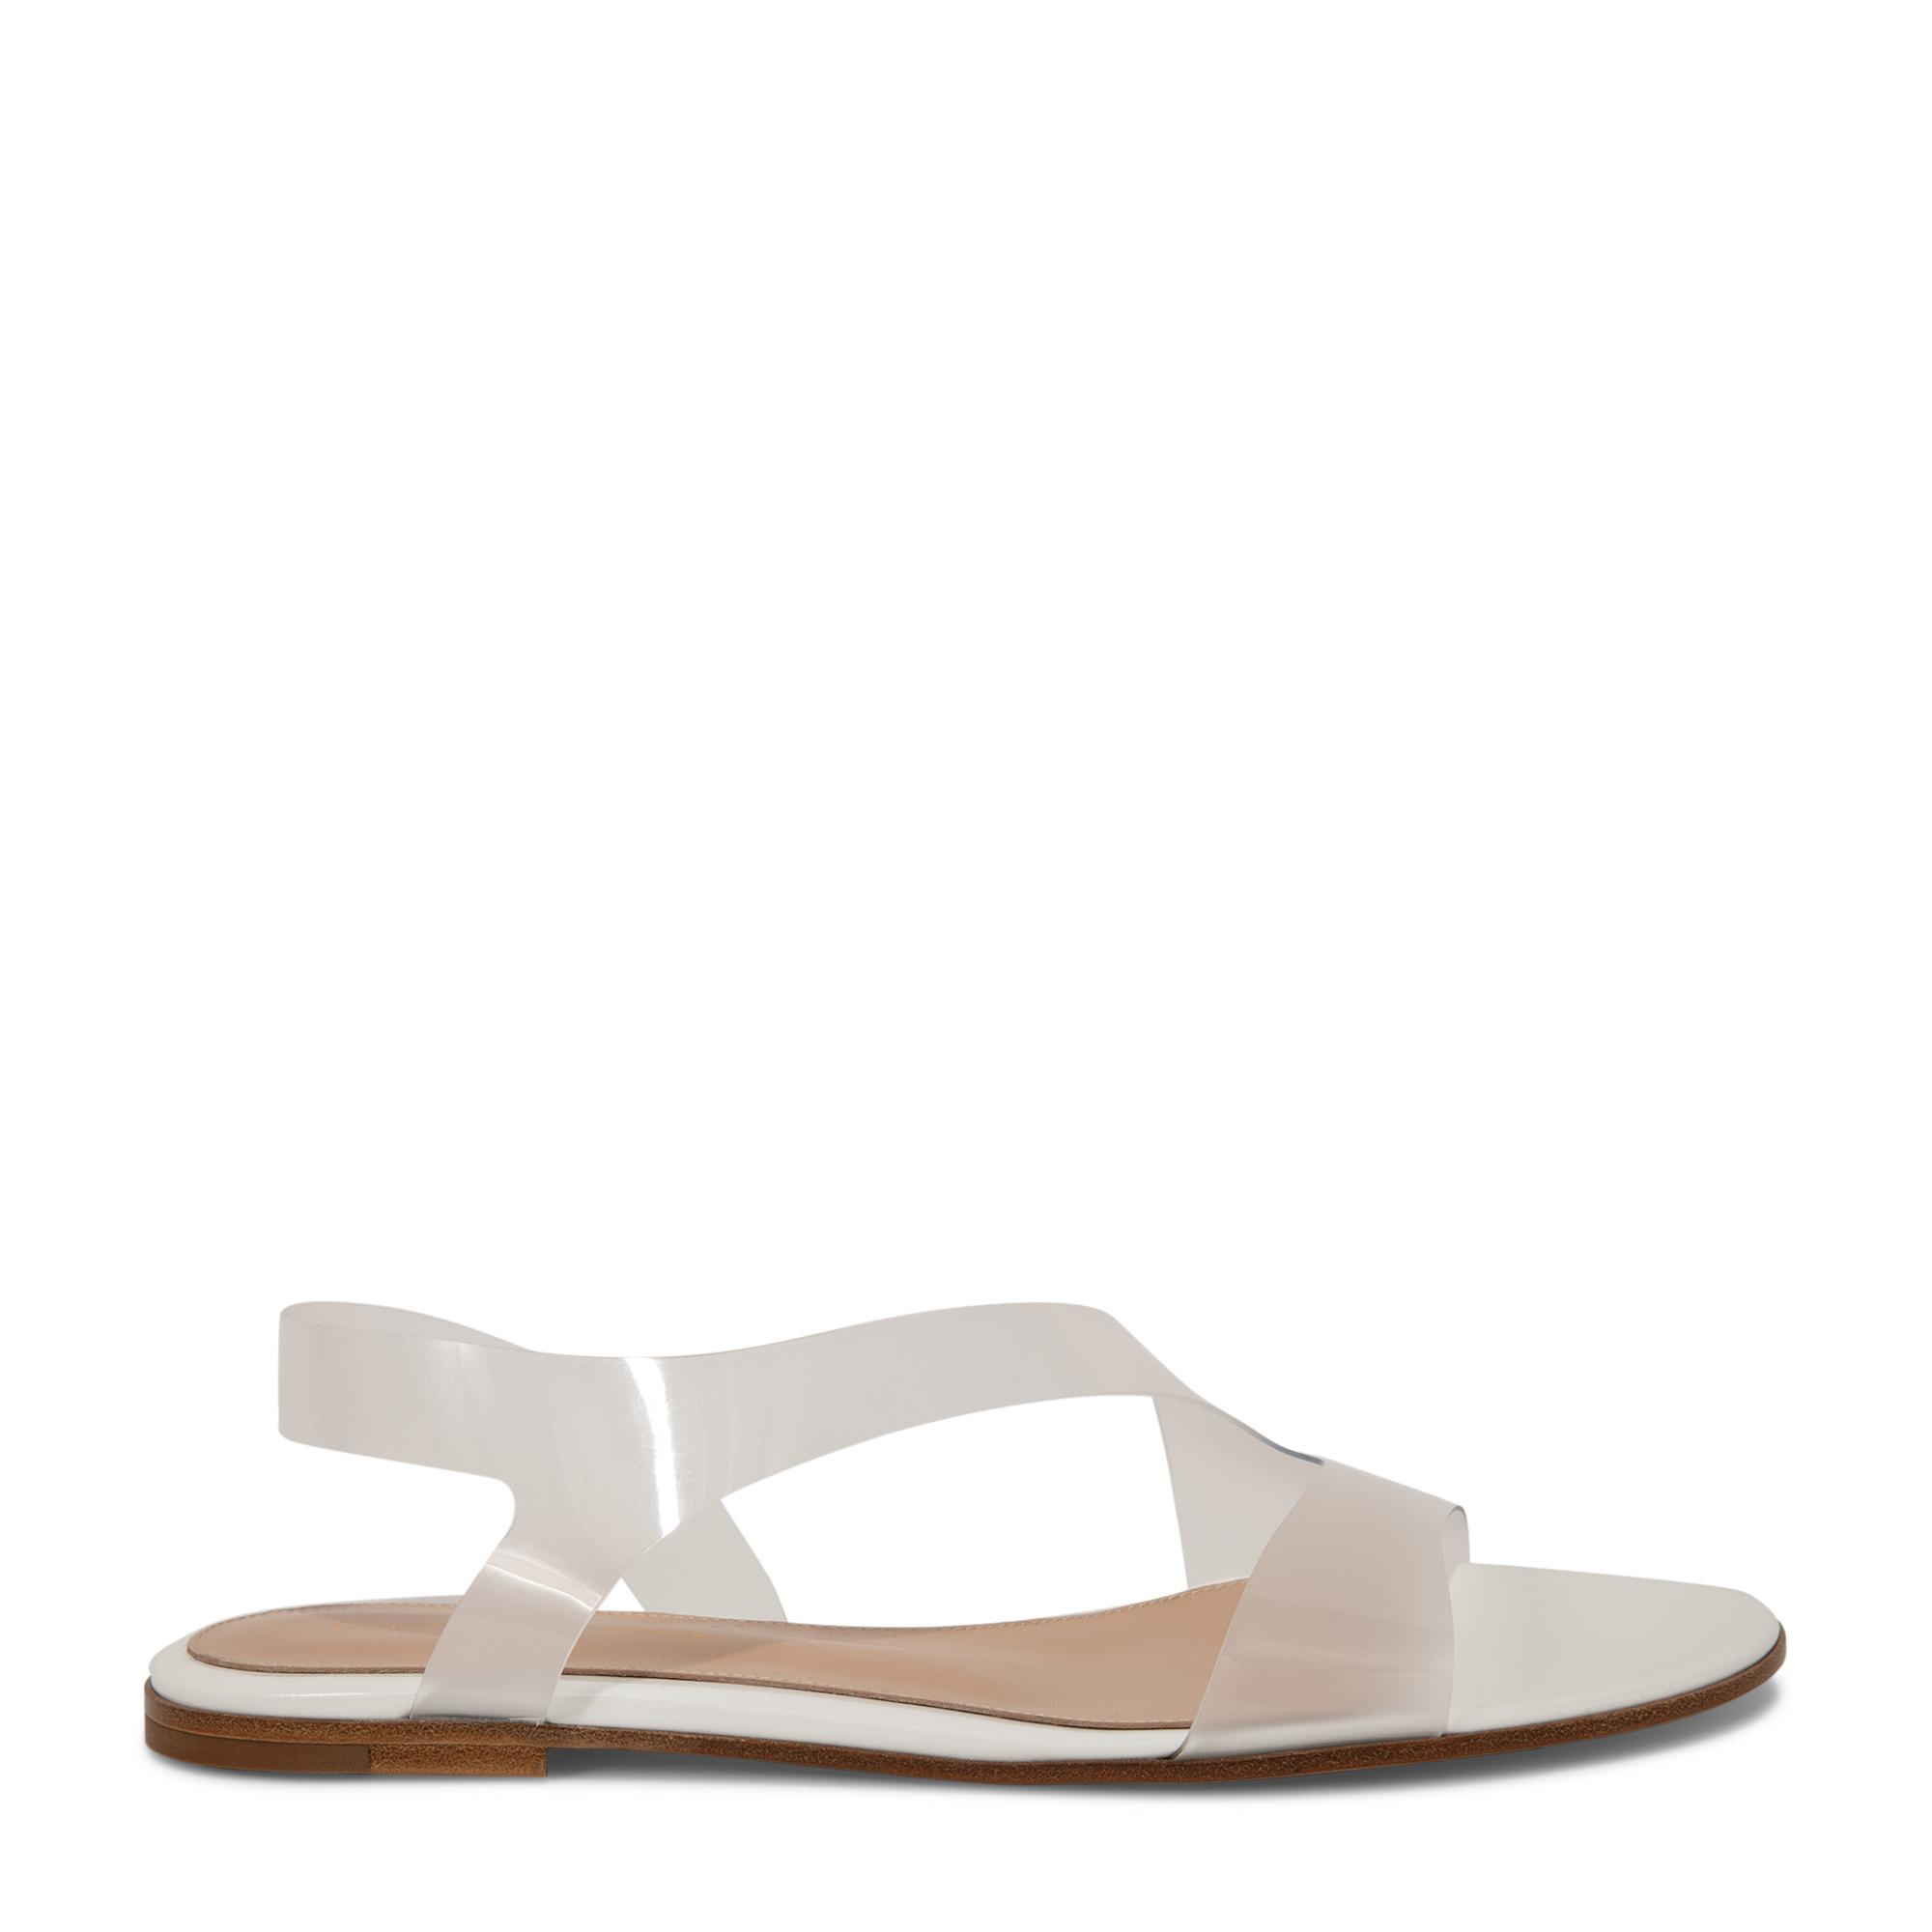 Metropolis sandals